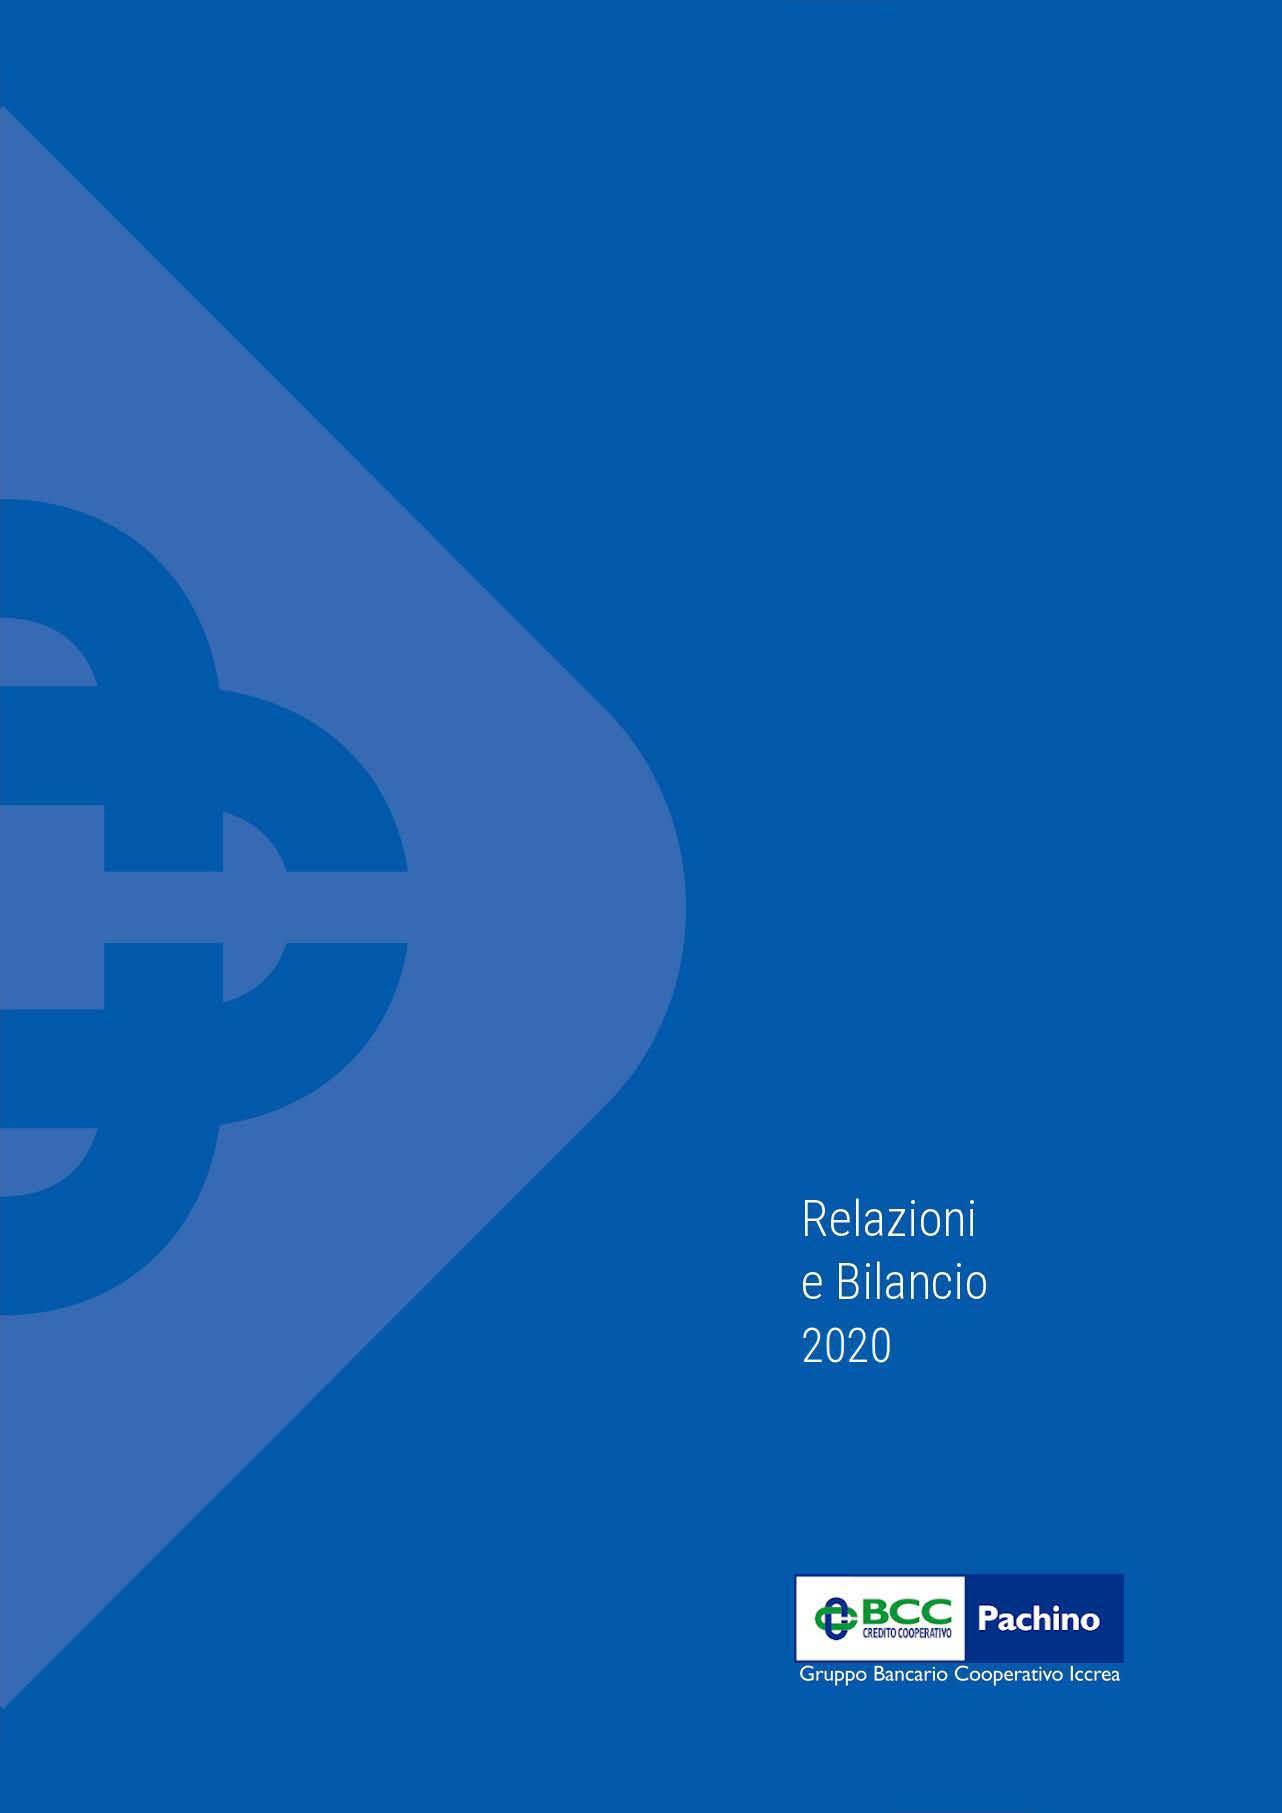 BCC Pachino - Bilancio 2020 copertina